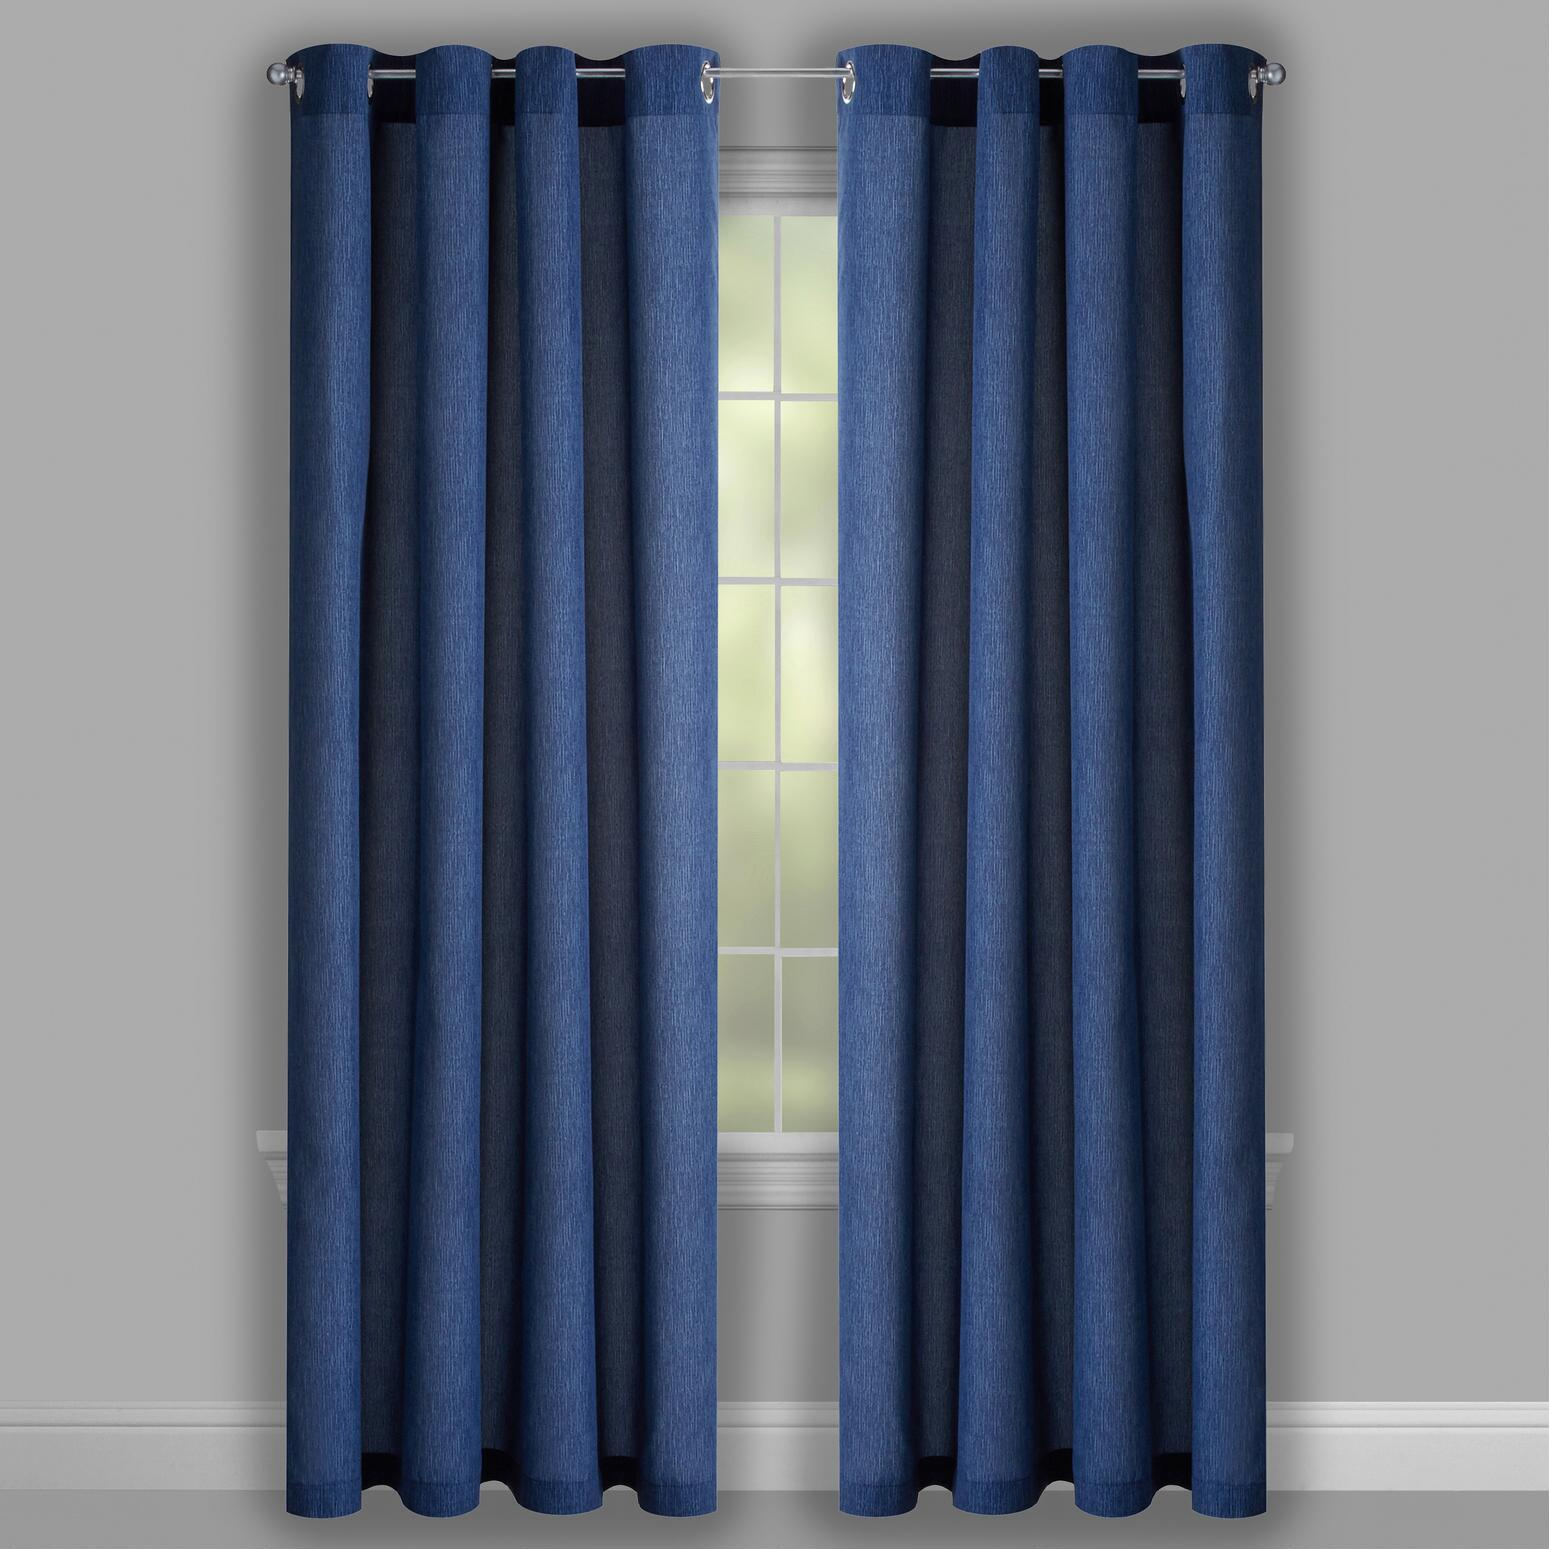 coastal window treatments coastal decor coastal living seascapestrade solid blue grommet indooroutdoor window curtains seascapes